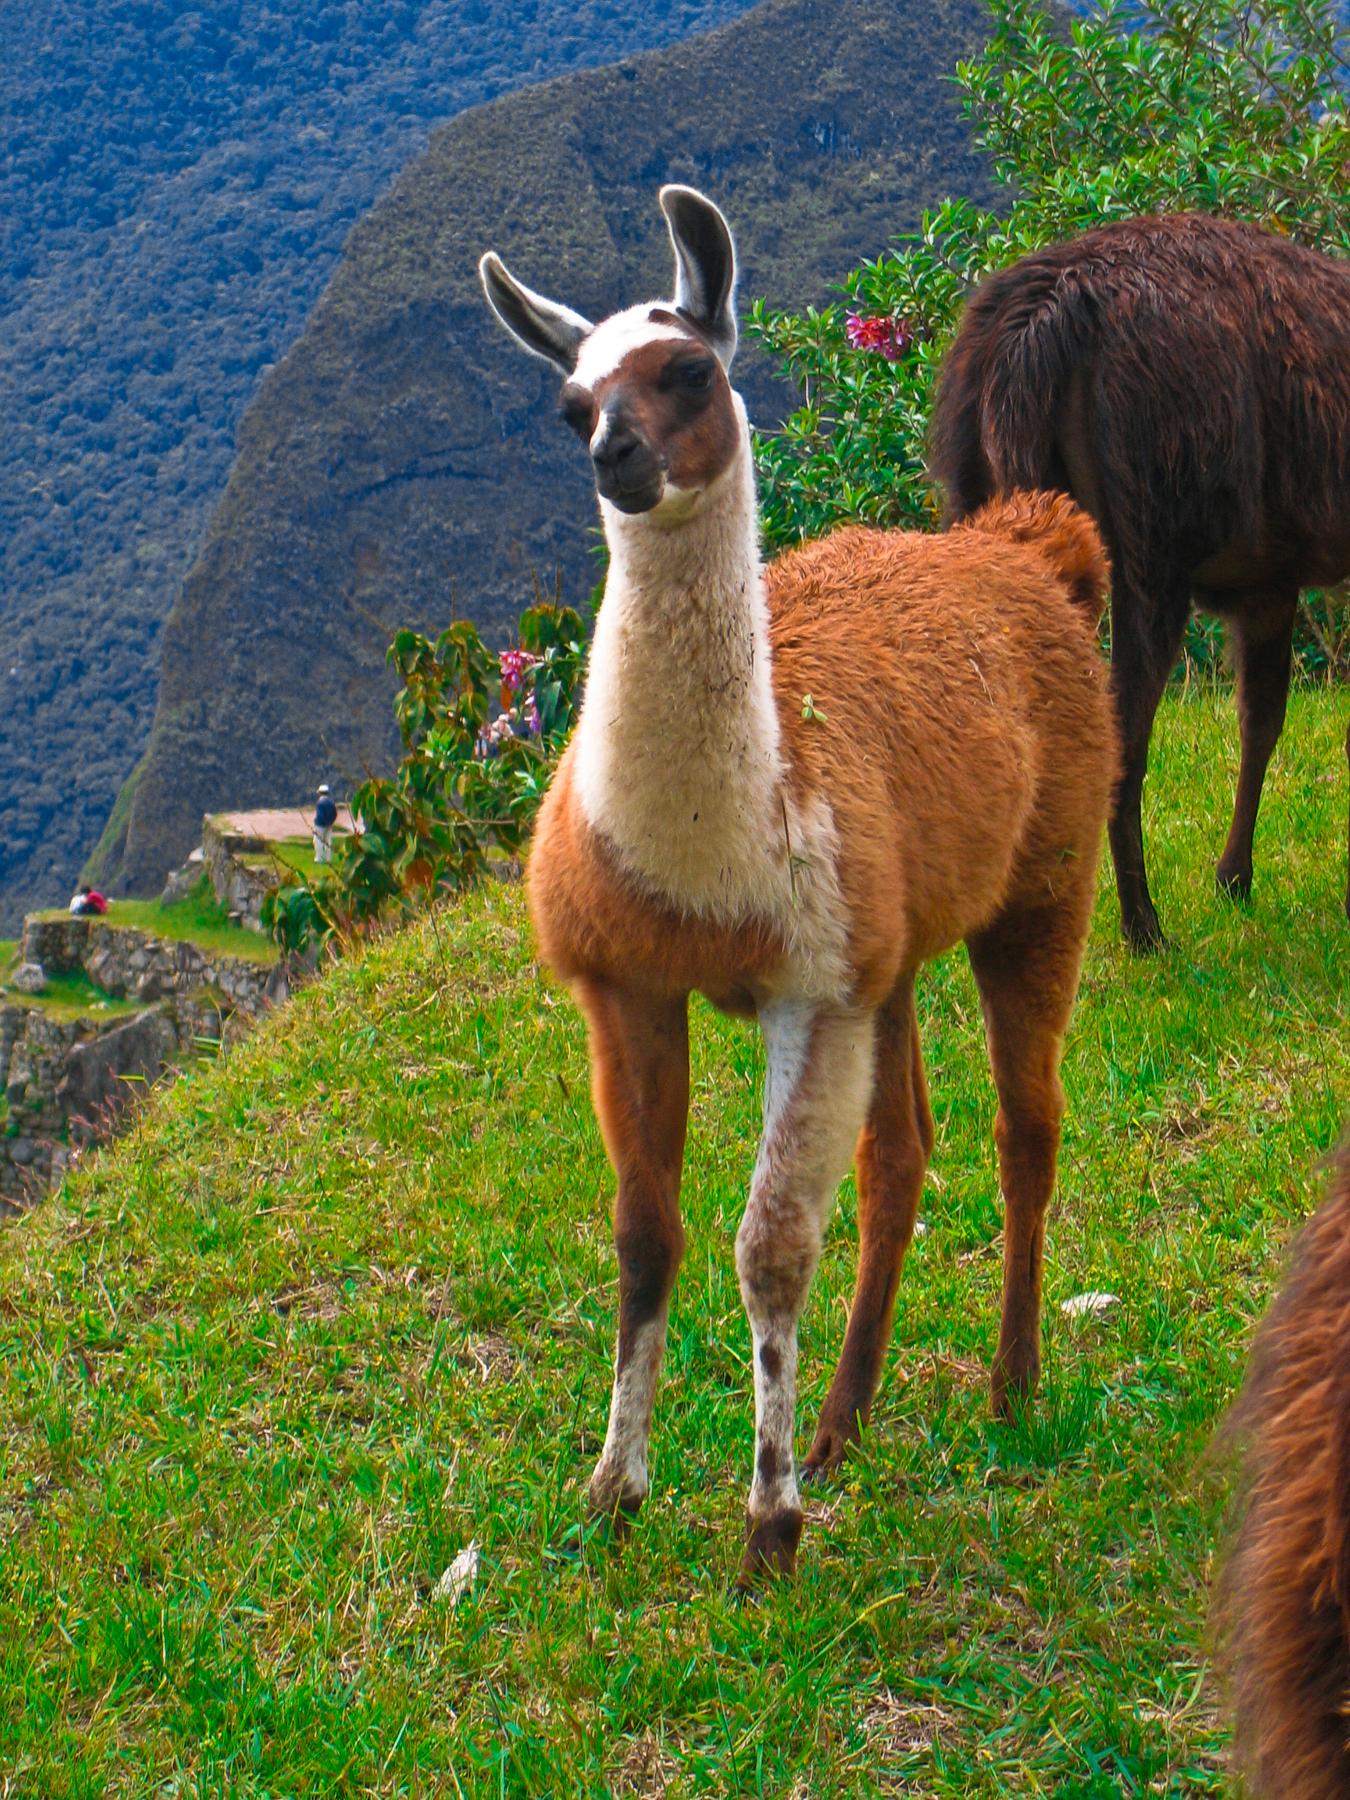 Machu Picchu Llama, America, Photograph, Maroon, Natural, HQ Photo